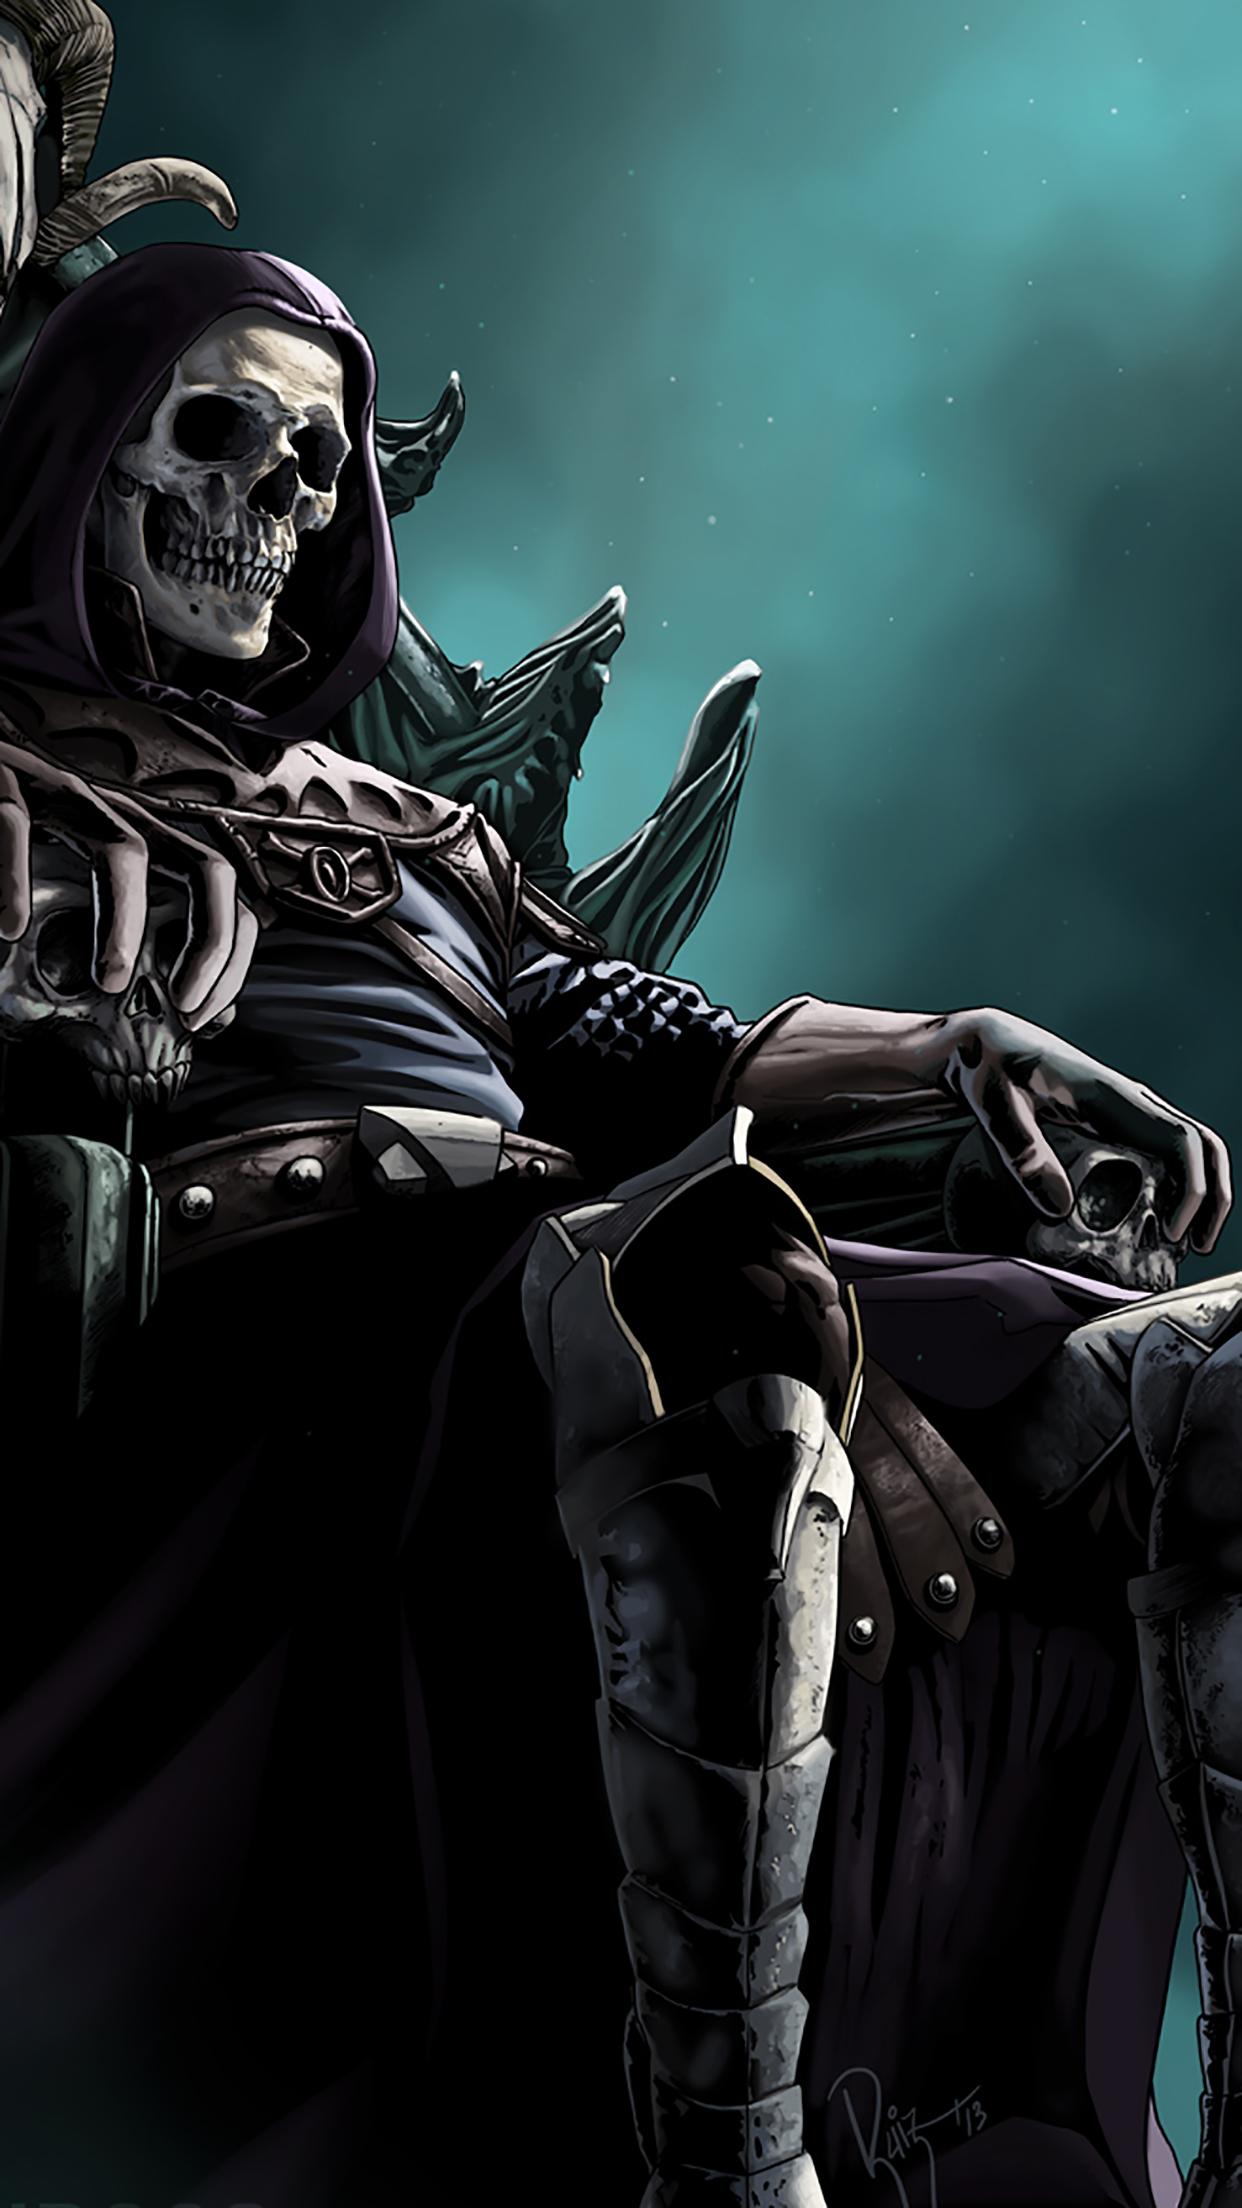 Skeletor In Black 3Wallpapers iPhone Parallax Skeletor : In Black